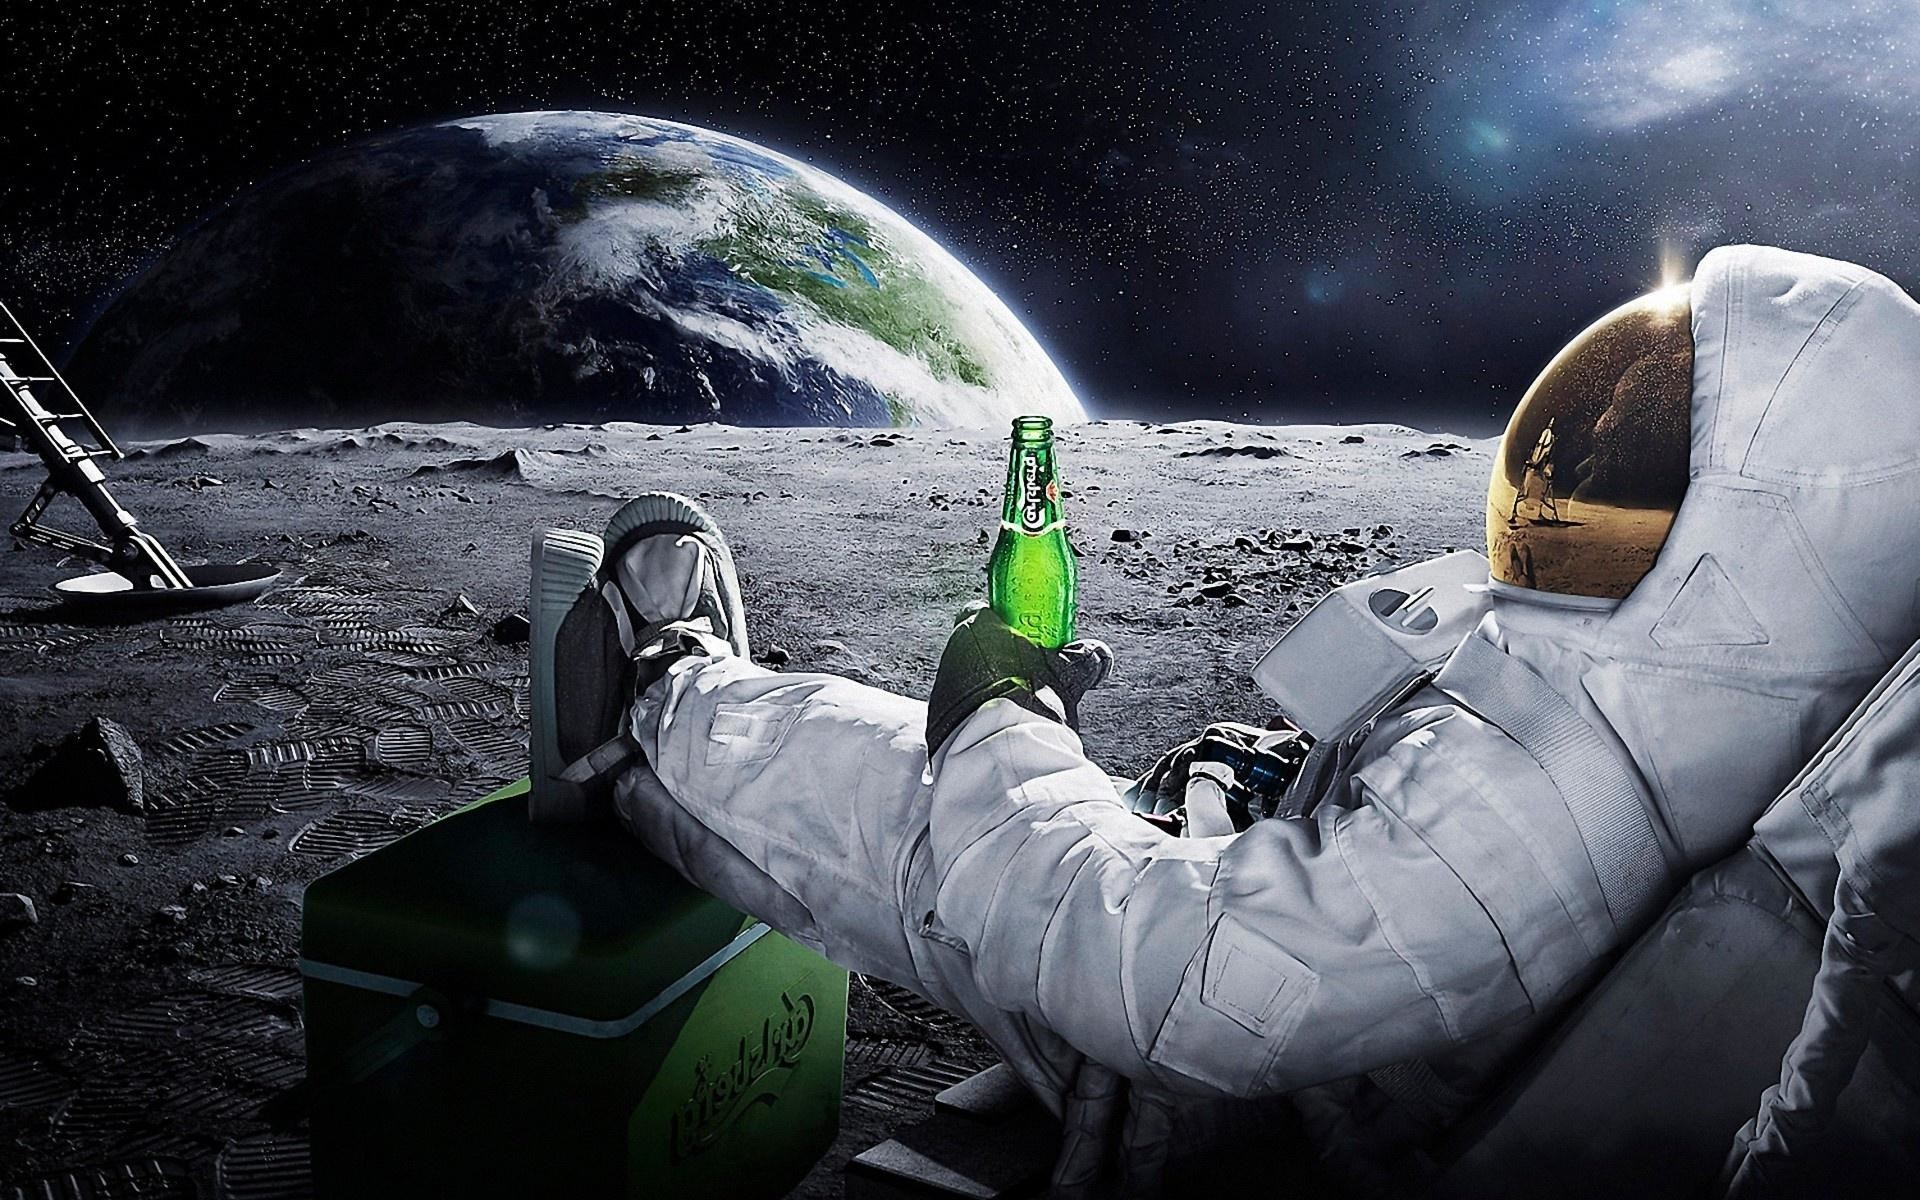 HD Astronaut Wallpaper 70 images 1920x1200